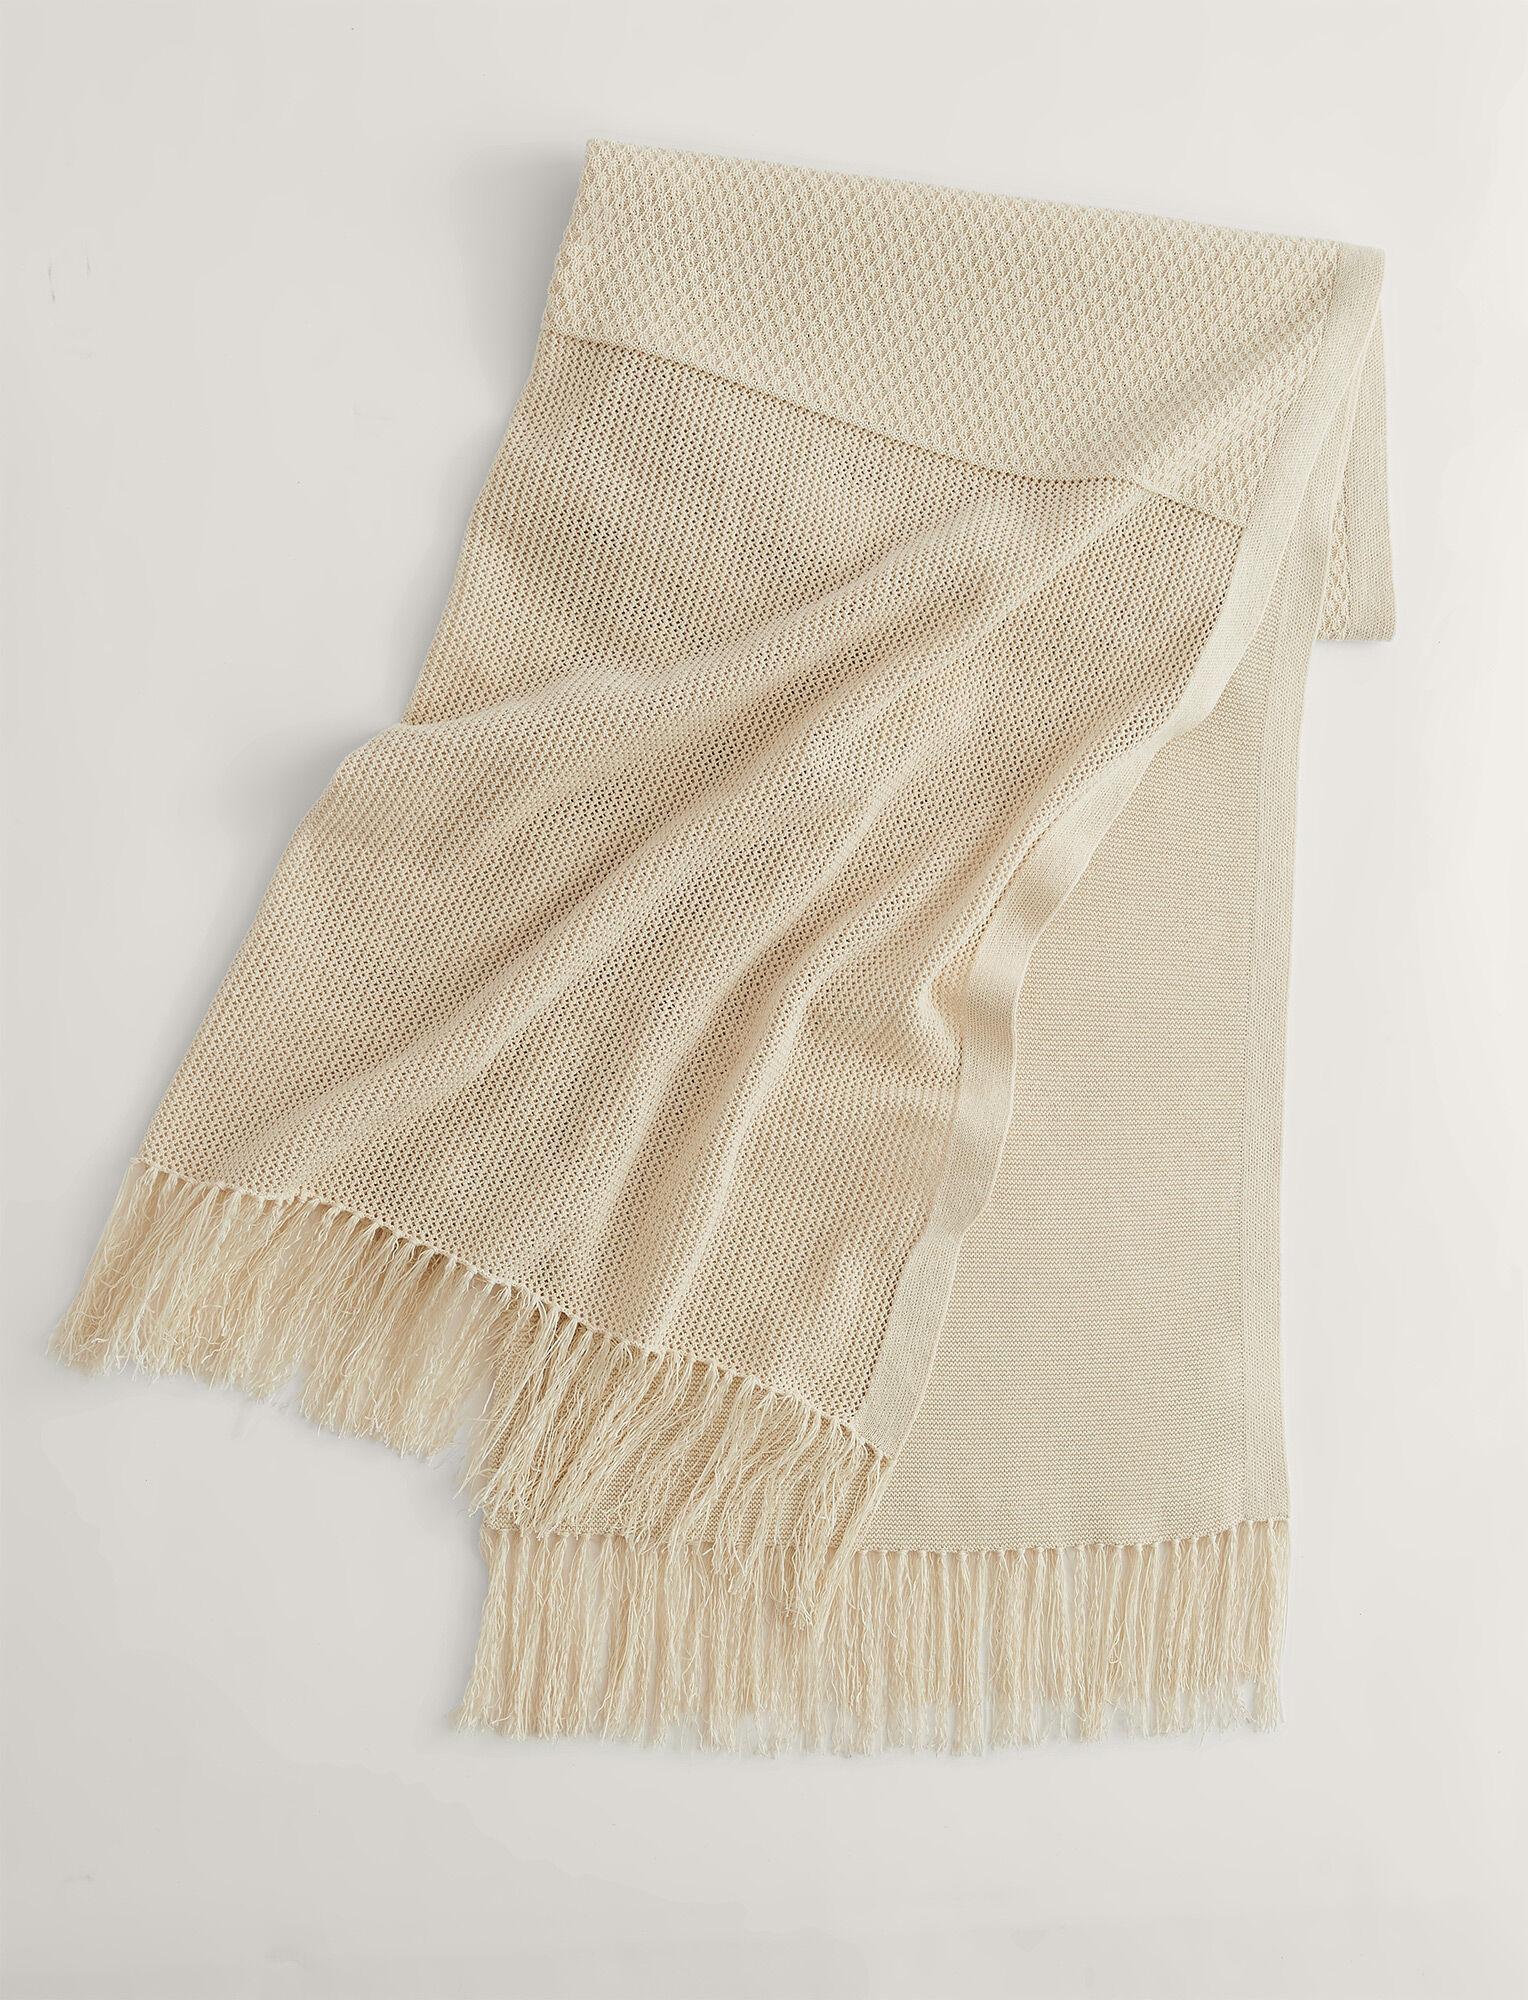 Joseph, Crispy Cotton Pareo Scarf, in PORCELAIN